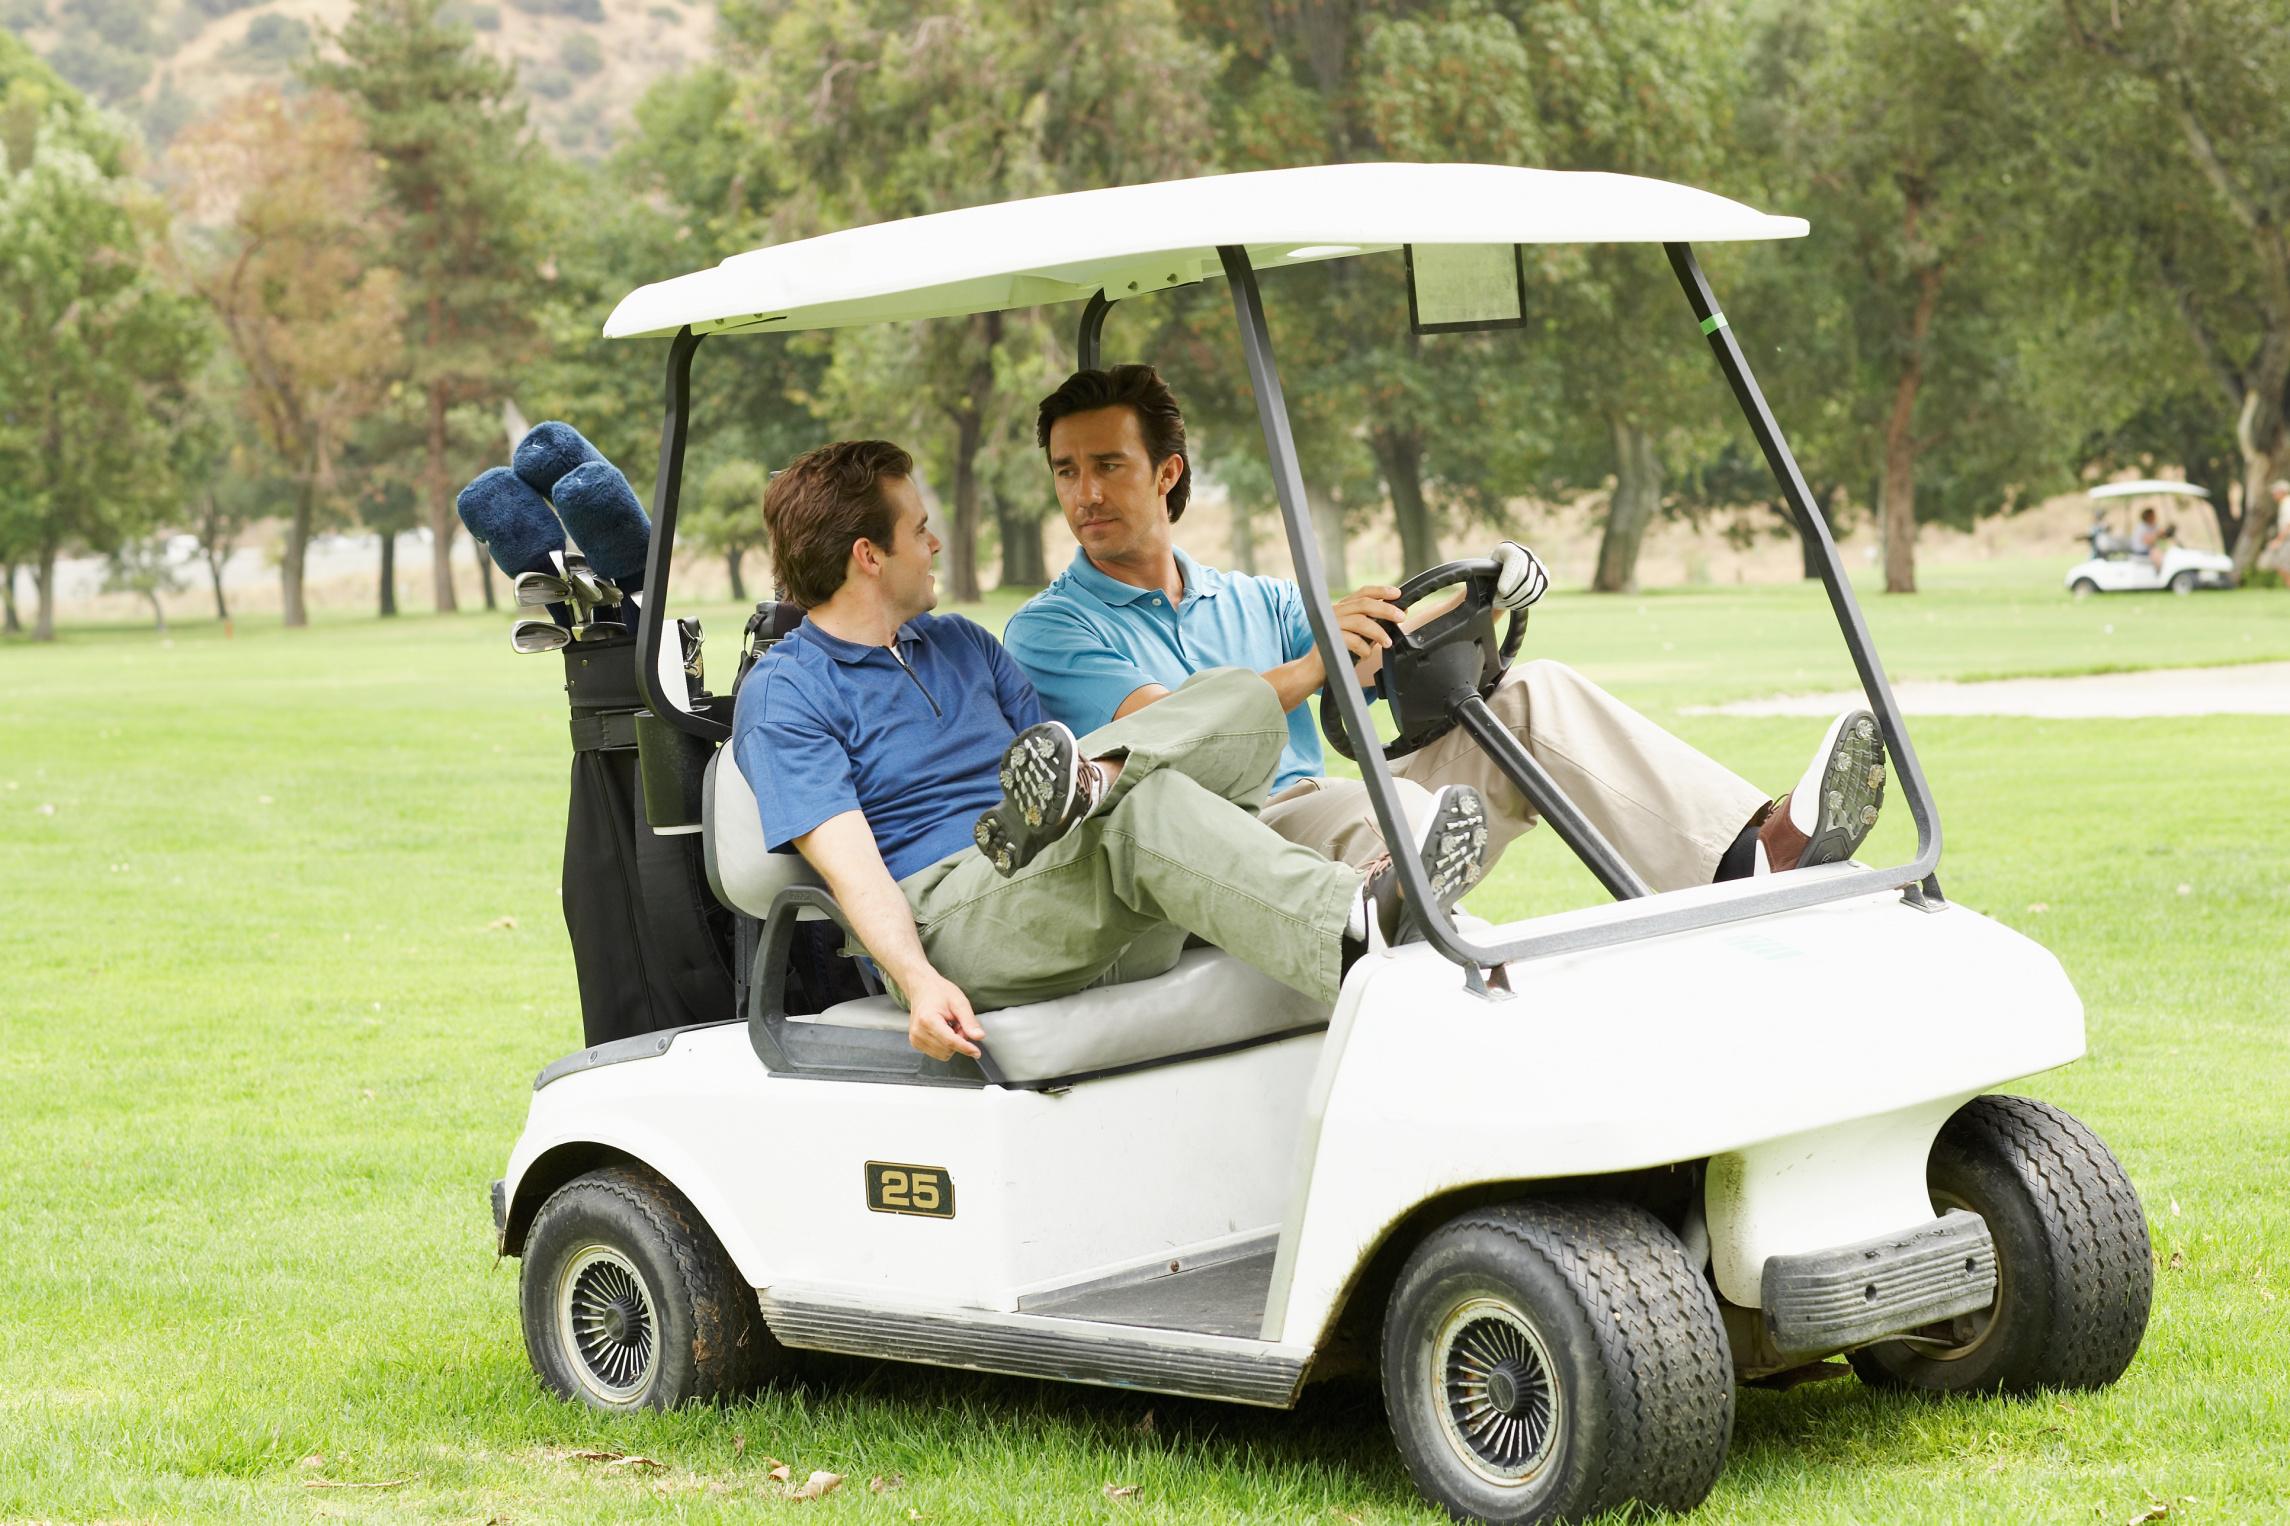 Ruff Amp Tuff Electric Golf Cart Wiring Diagram | Wiring Diagram - Ez Go Electric Golf Cart Wiring Diagram